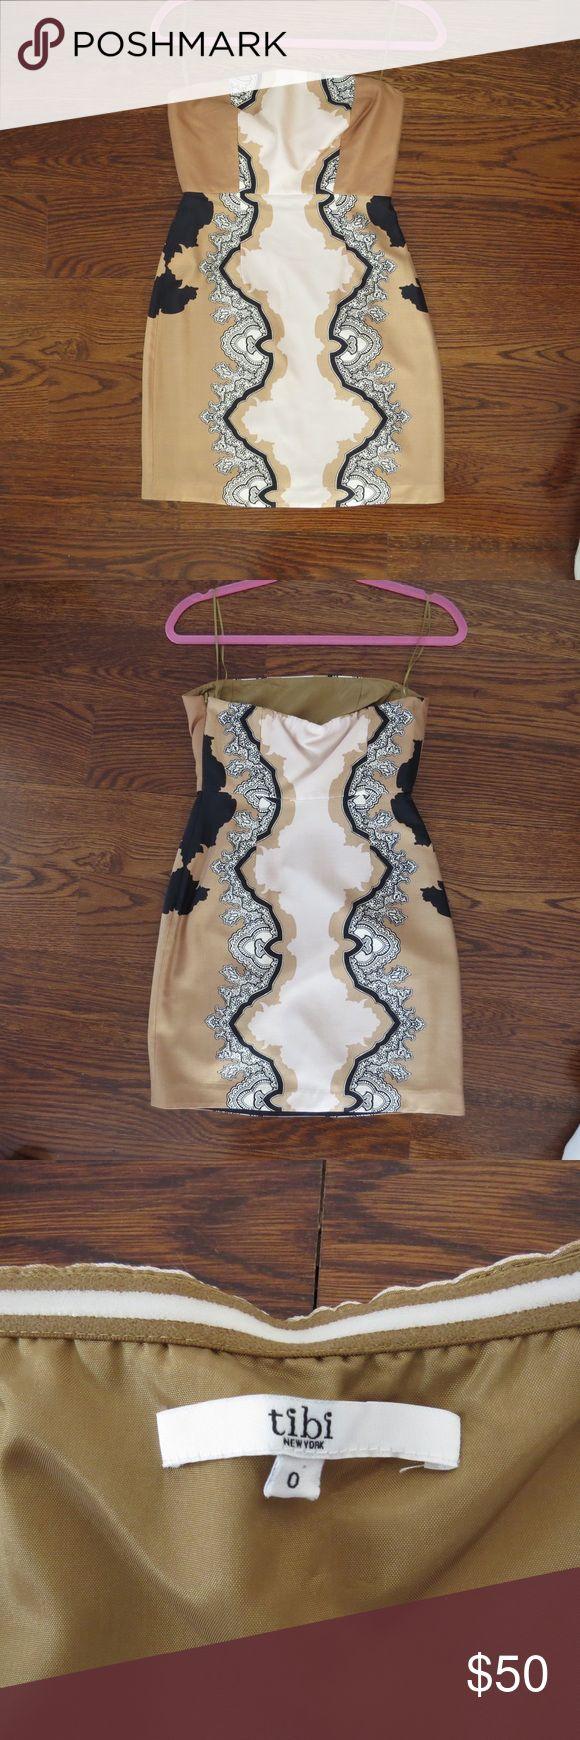 Tibi Mini Cocktail Dress Strapless neutral mini dress perfect for special occasions. Worn once! Tibi Dresses Mini